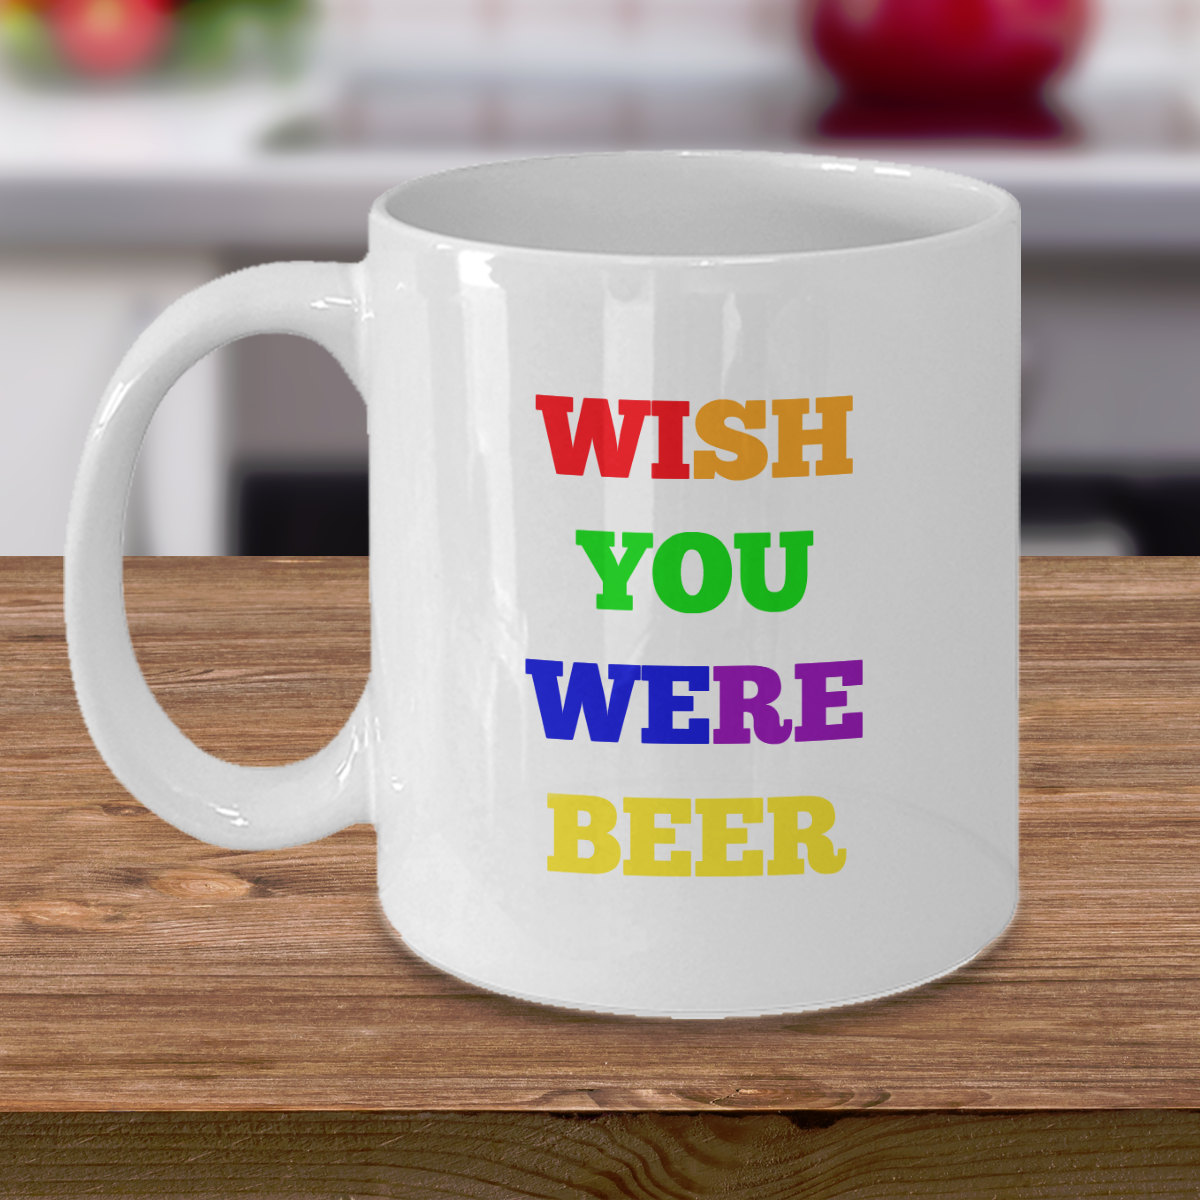 Funny Coffee Mug Gift For Pink Floyd Rock Music Fans Him Her Men Women Dad Mom F